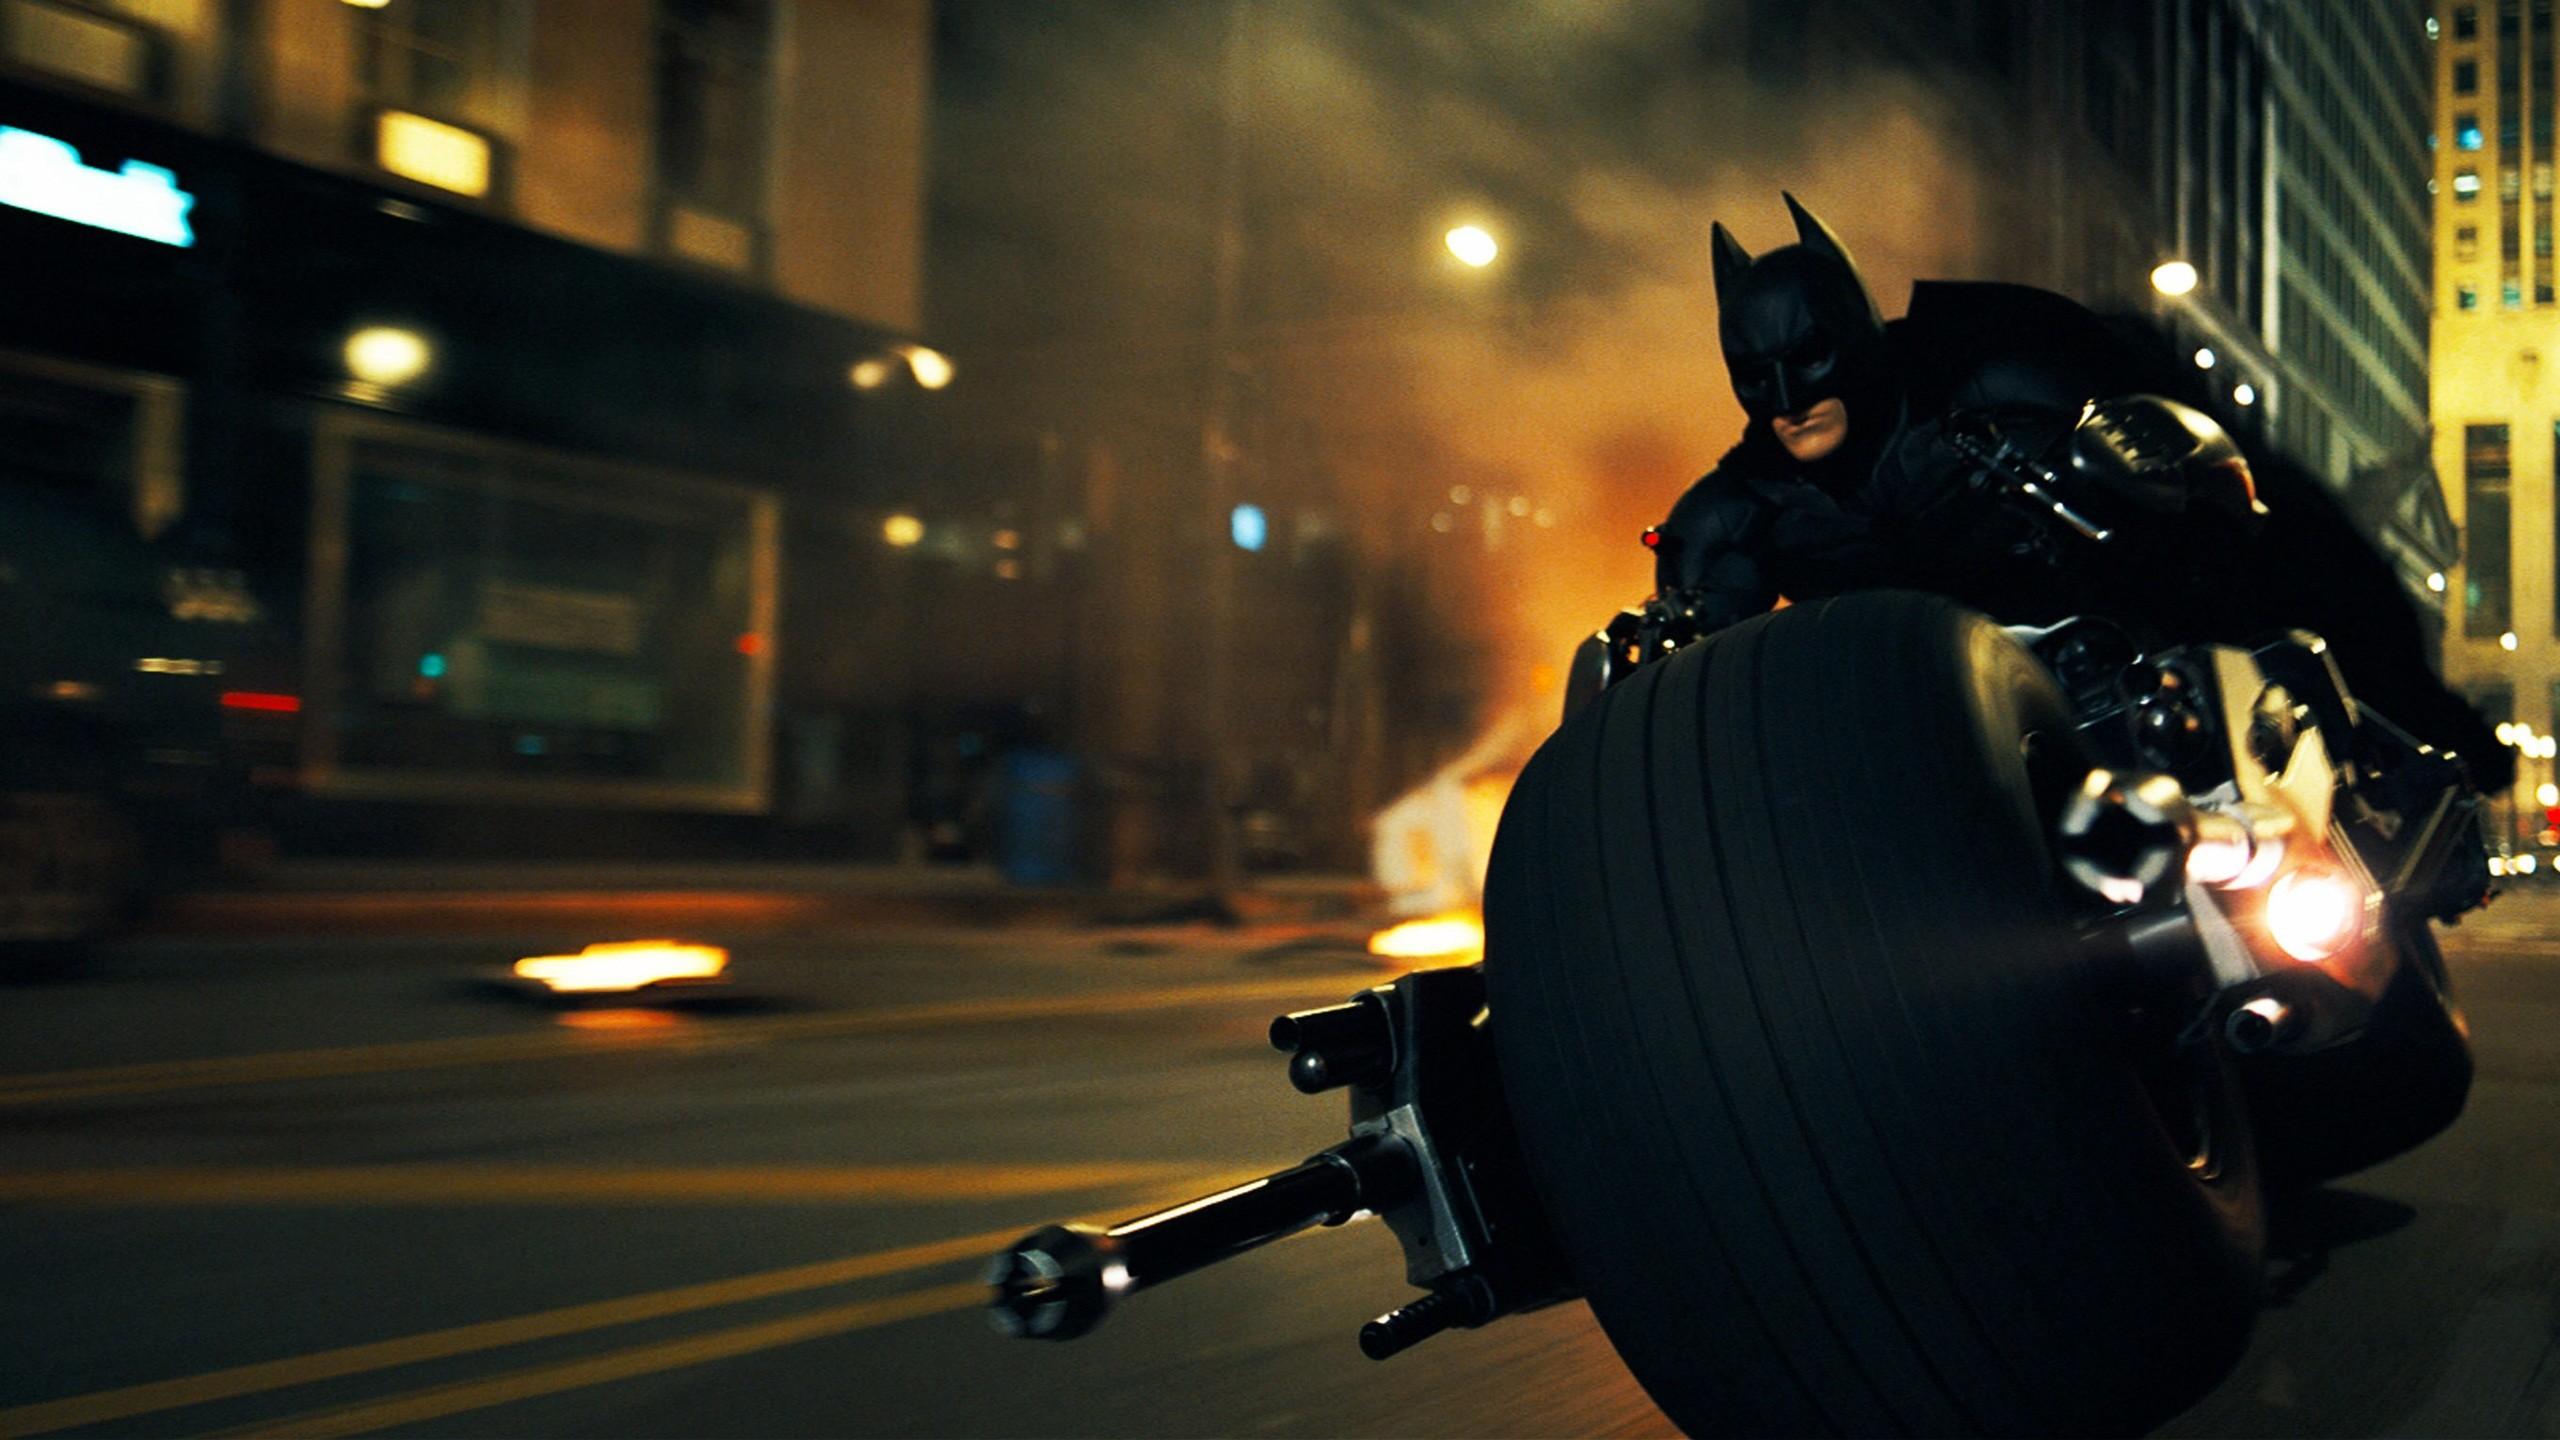 Batman in Dark Knight Rises Wallpapers   HD Wallpapers